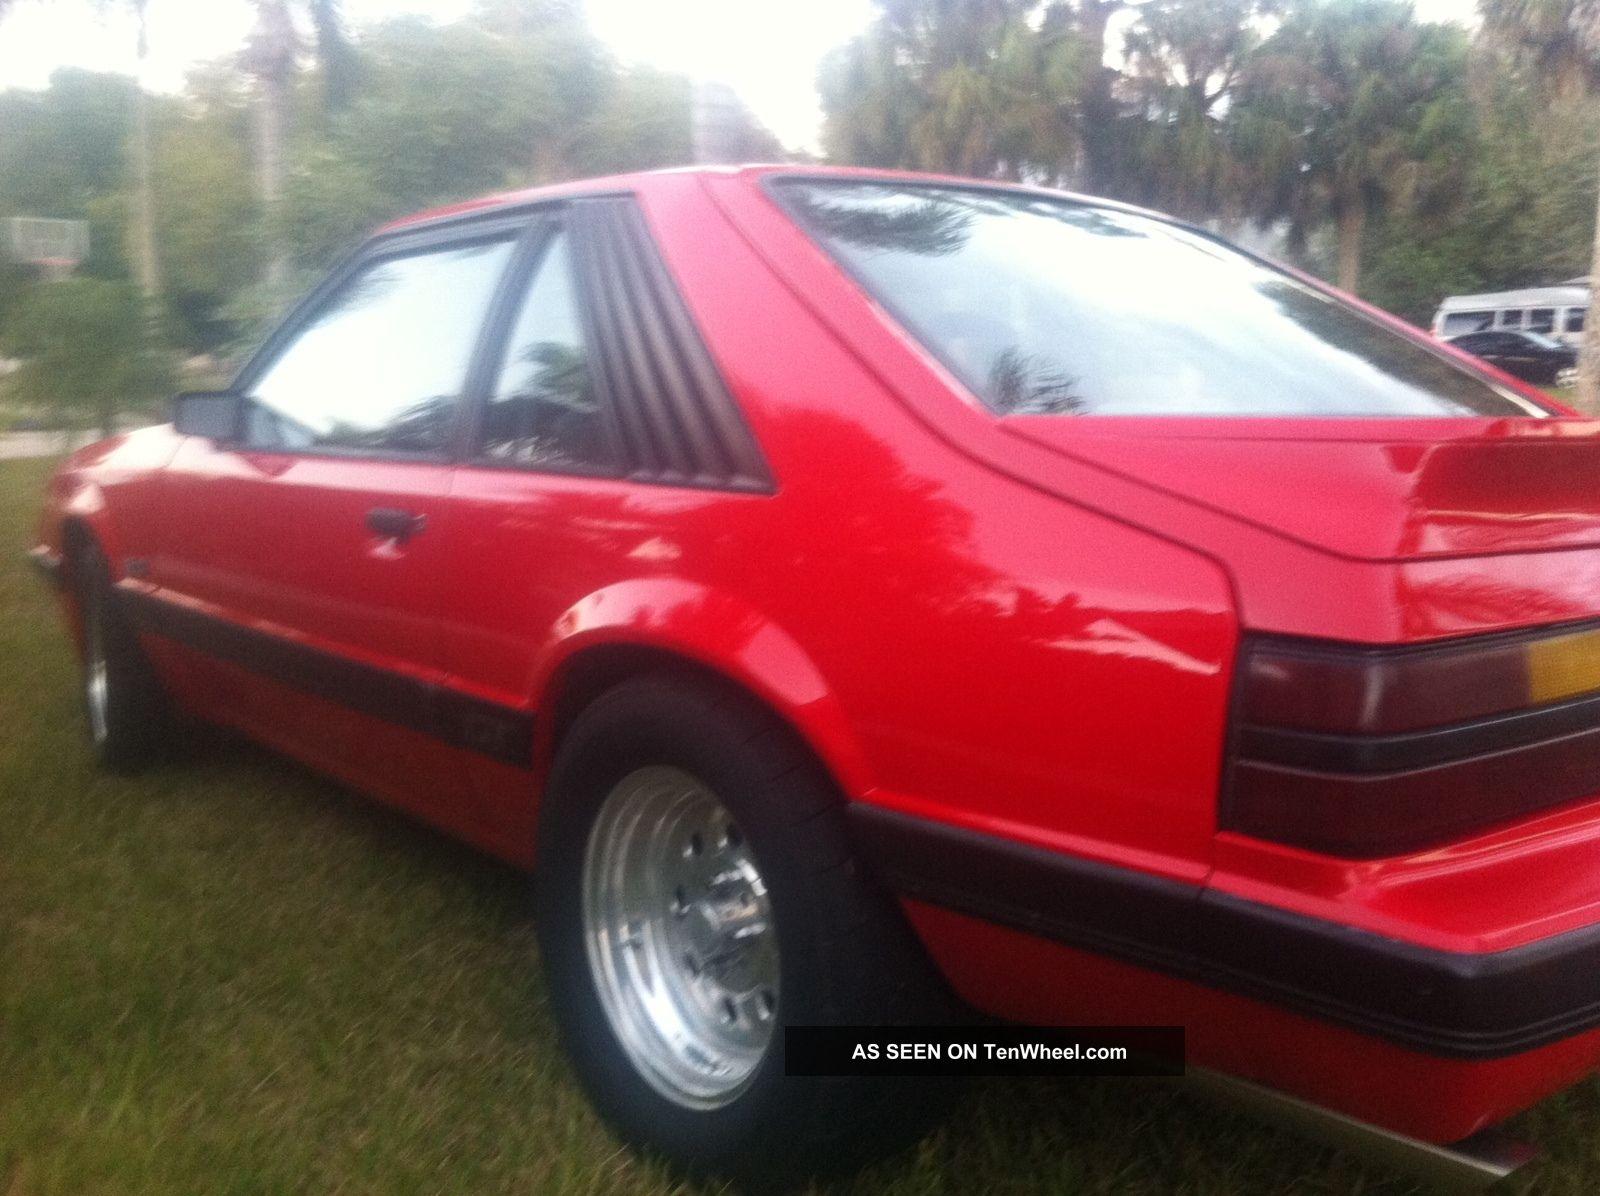 1985 Ford Mustang Gt Hatchback 2 Door 5 0l